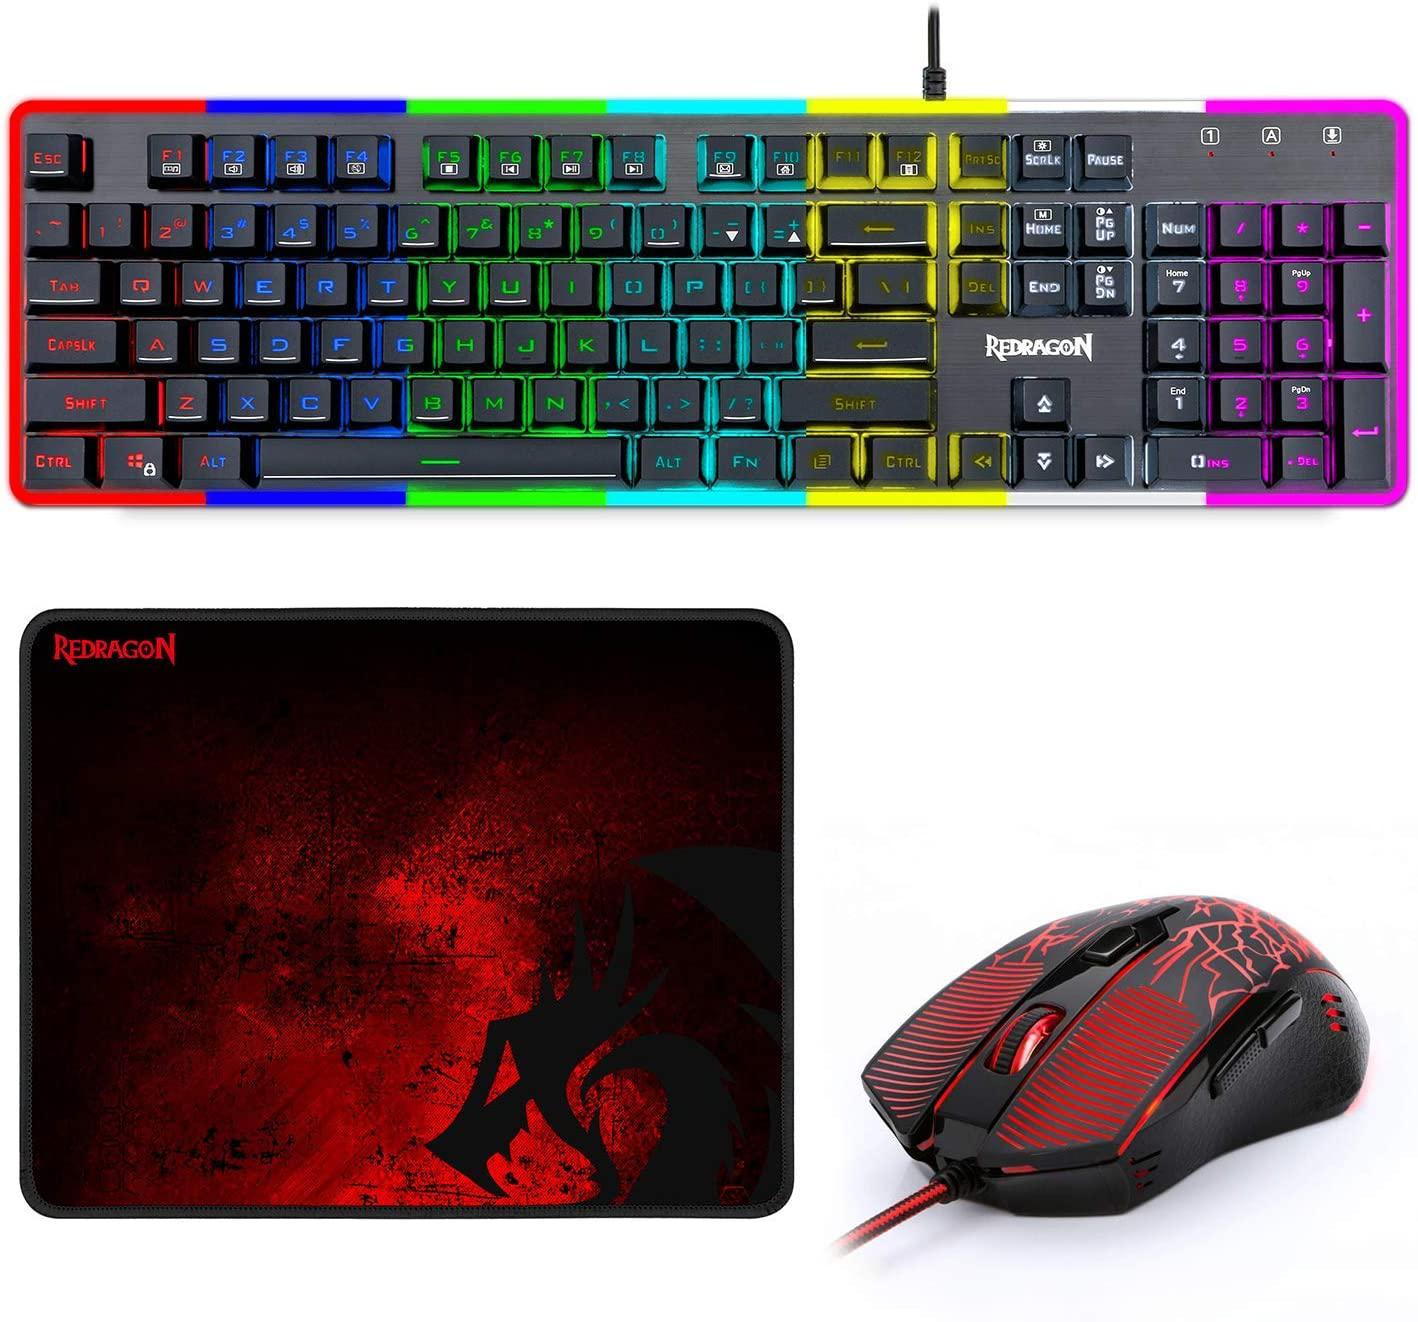 Rainbow Gaming Keyboard And Mouse Set RGB Backlit & Edge Sid